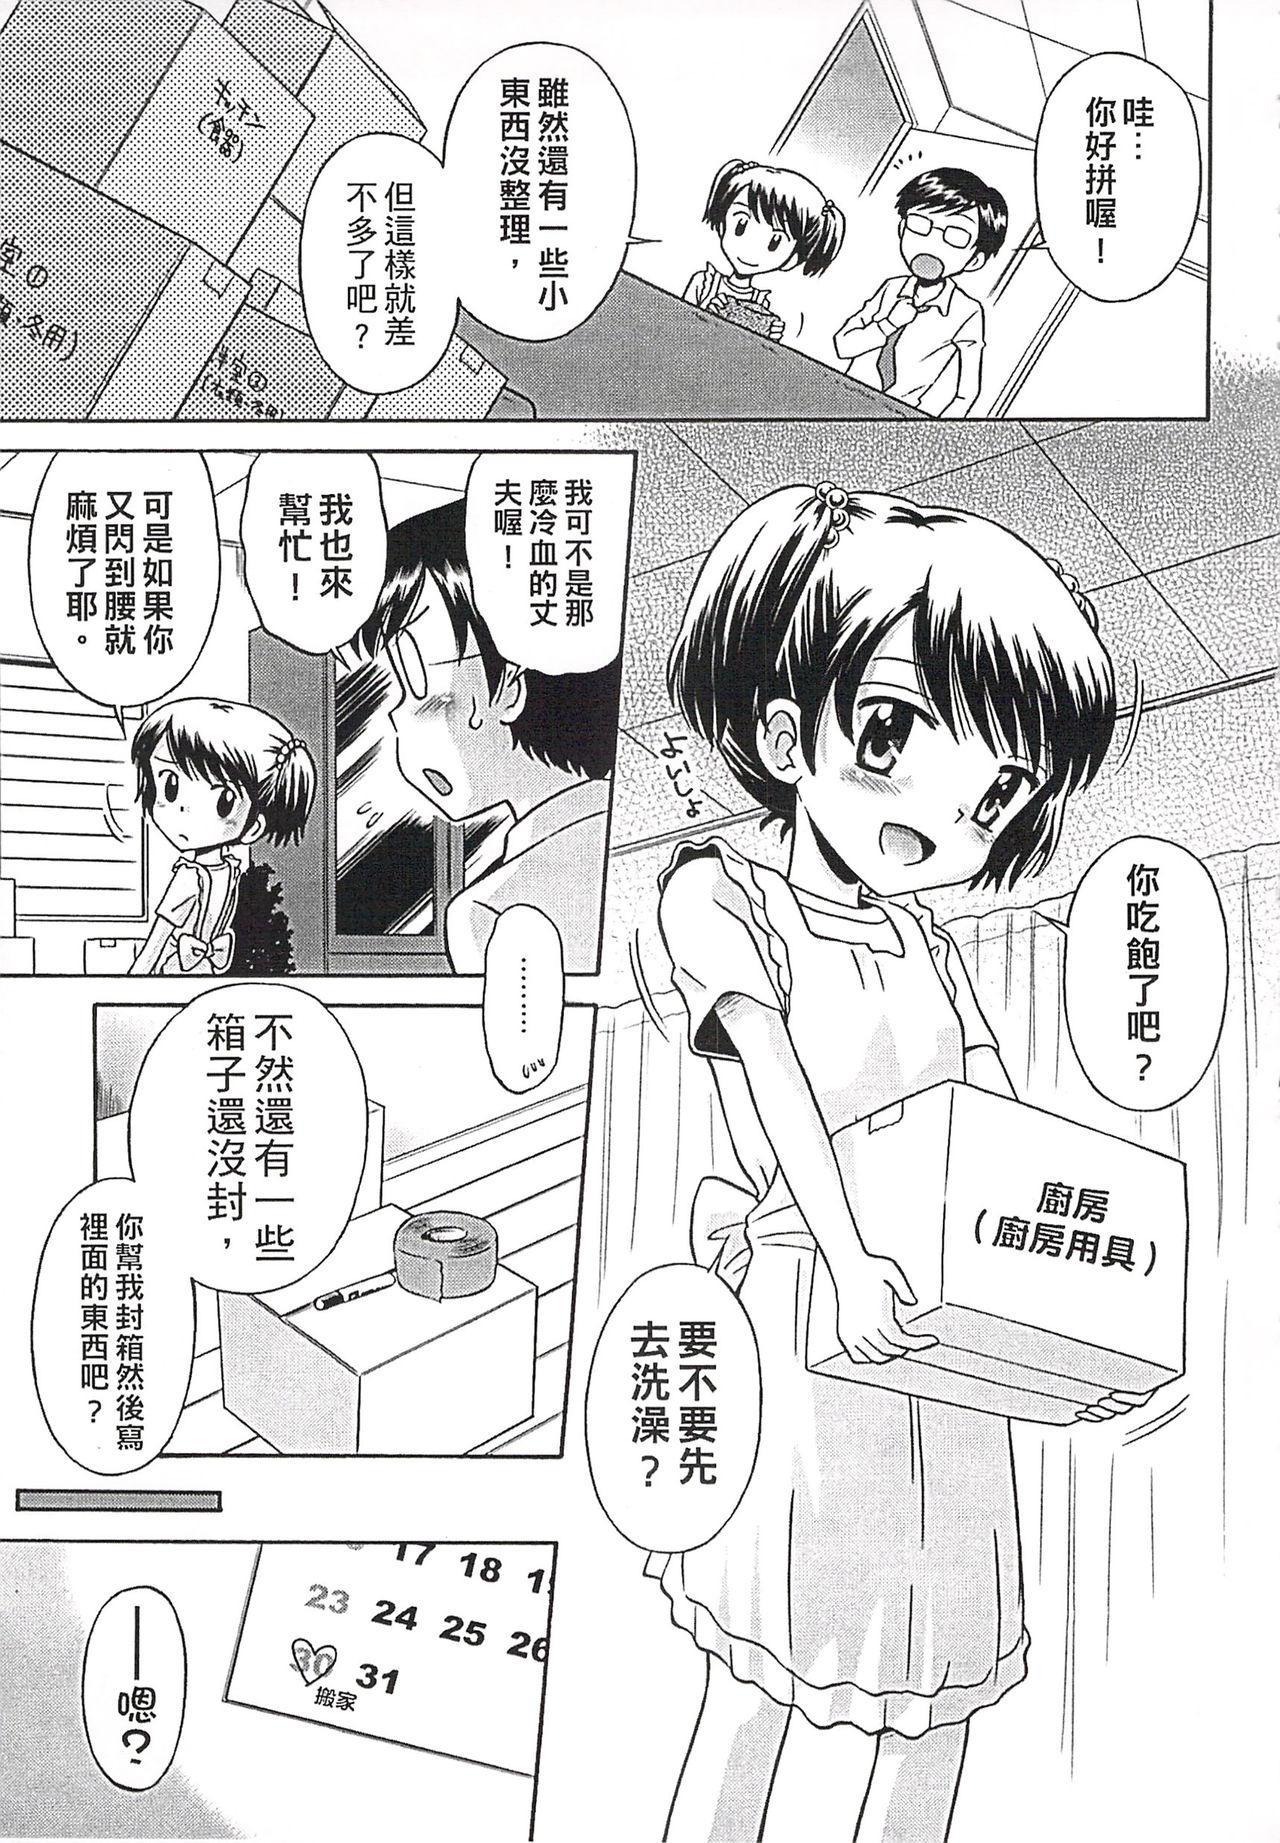 Kore demo Otona Desu Kedo!? Mrs.LOLITA Kanzenban   人家是大人啦! ~Mrs.LOLITA完全版 102